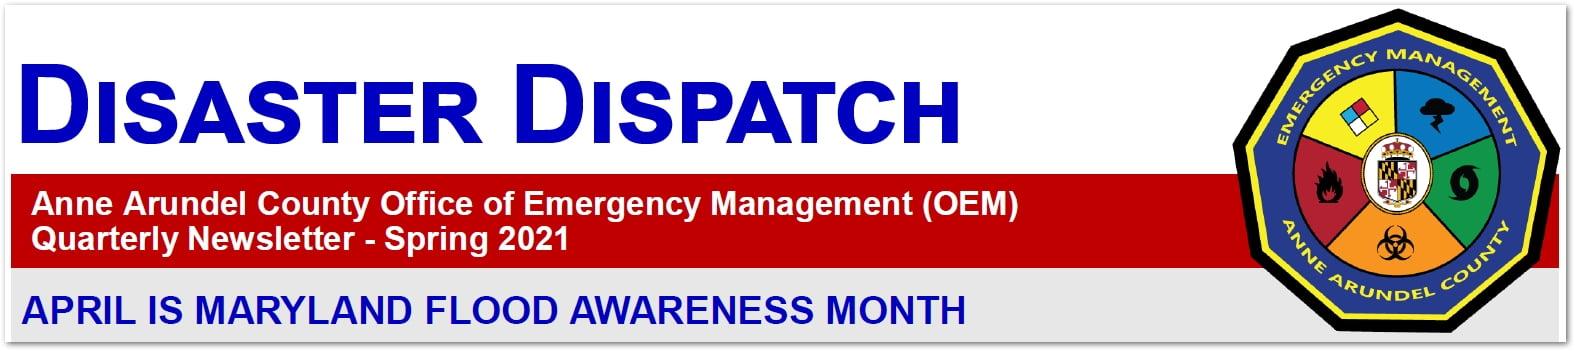 AAC OEM Disaster Dispatch Spring 2021